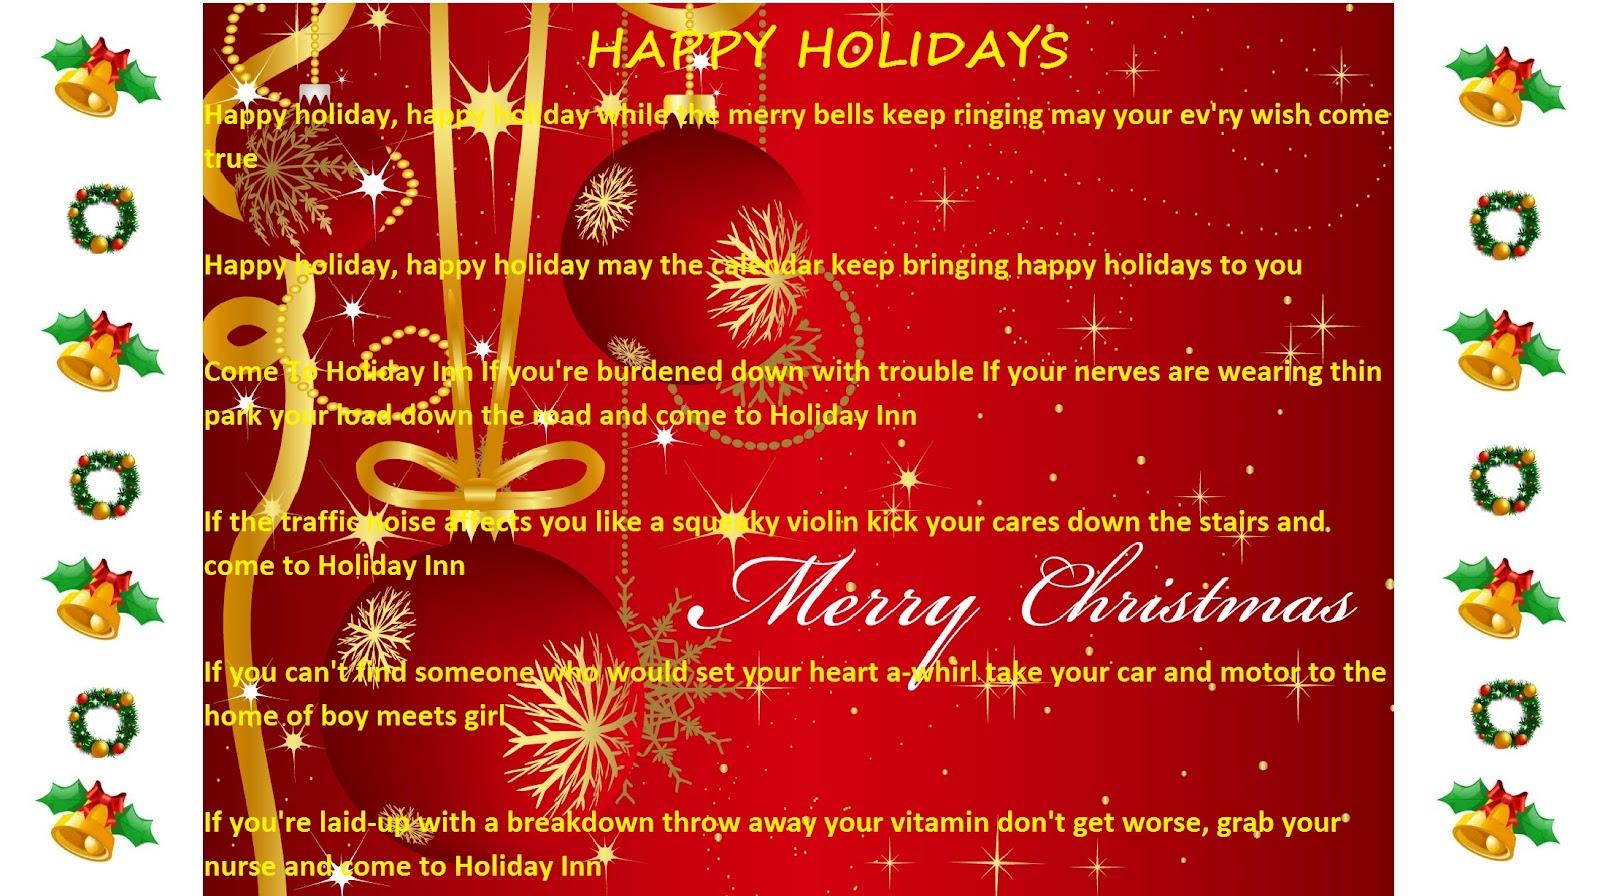 Lyrics containing the term: happy holidays